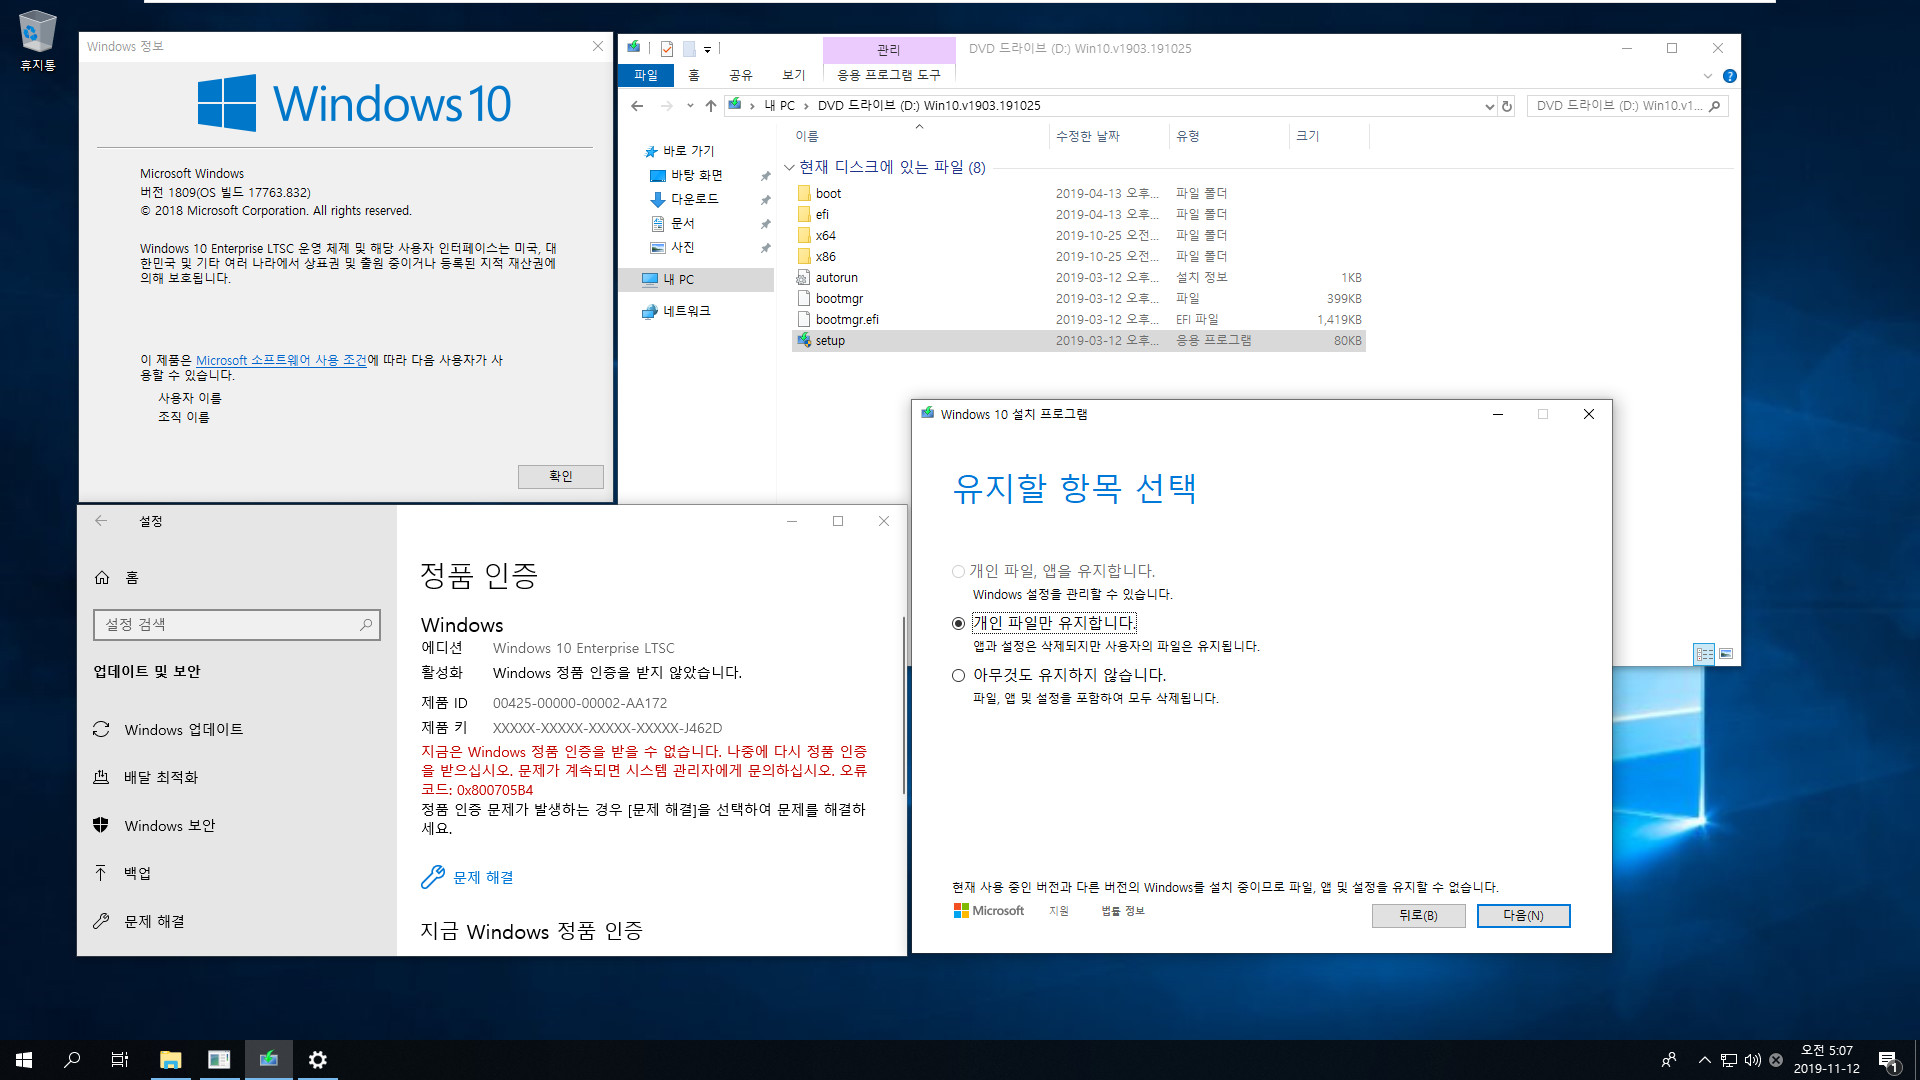 Windows 10 Enterprise LTSC [2019] (버전 1809) 를 버전 1903 프로로 업그레이드 설치하기 - 우선 설정과 앱 유지를 위해서 버전 1903 Enterprise로 업그레이드 한 후에 버전 1903 Pro로 변경하면 됩니다 2019-11-12_050723.jpg